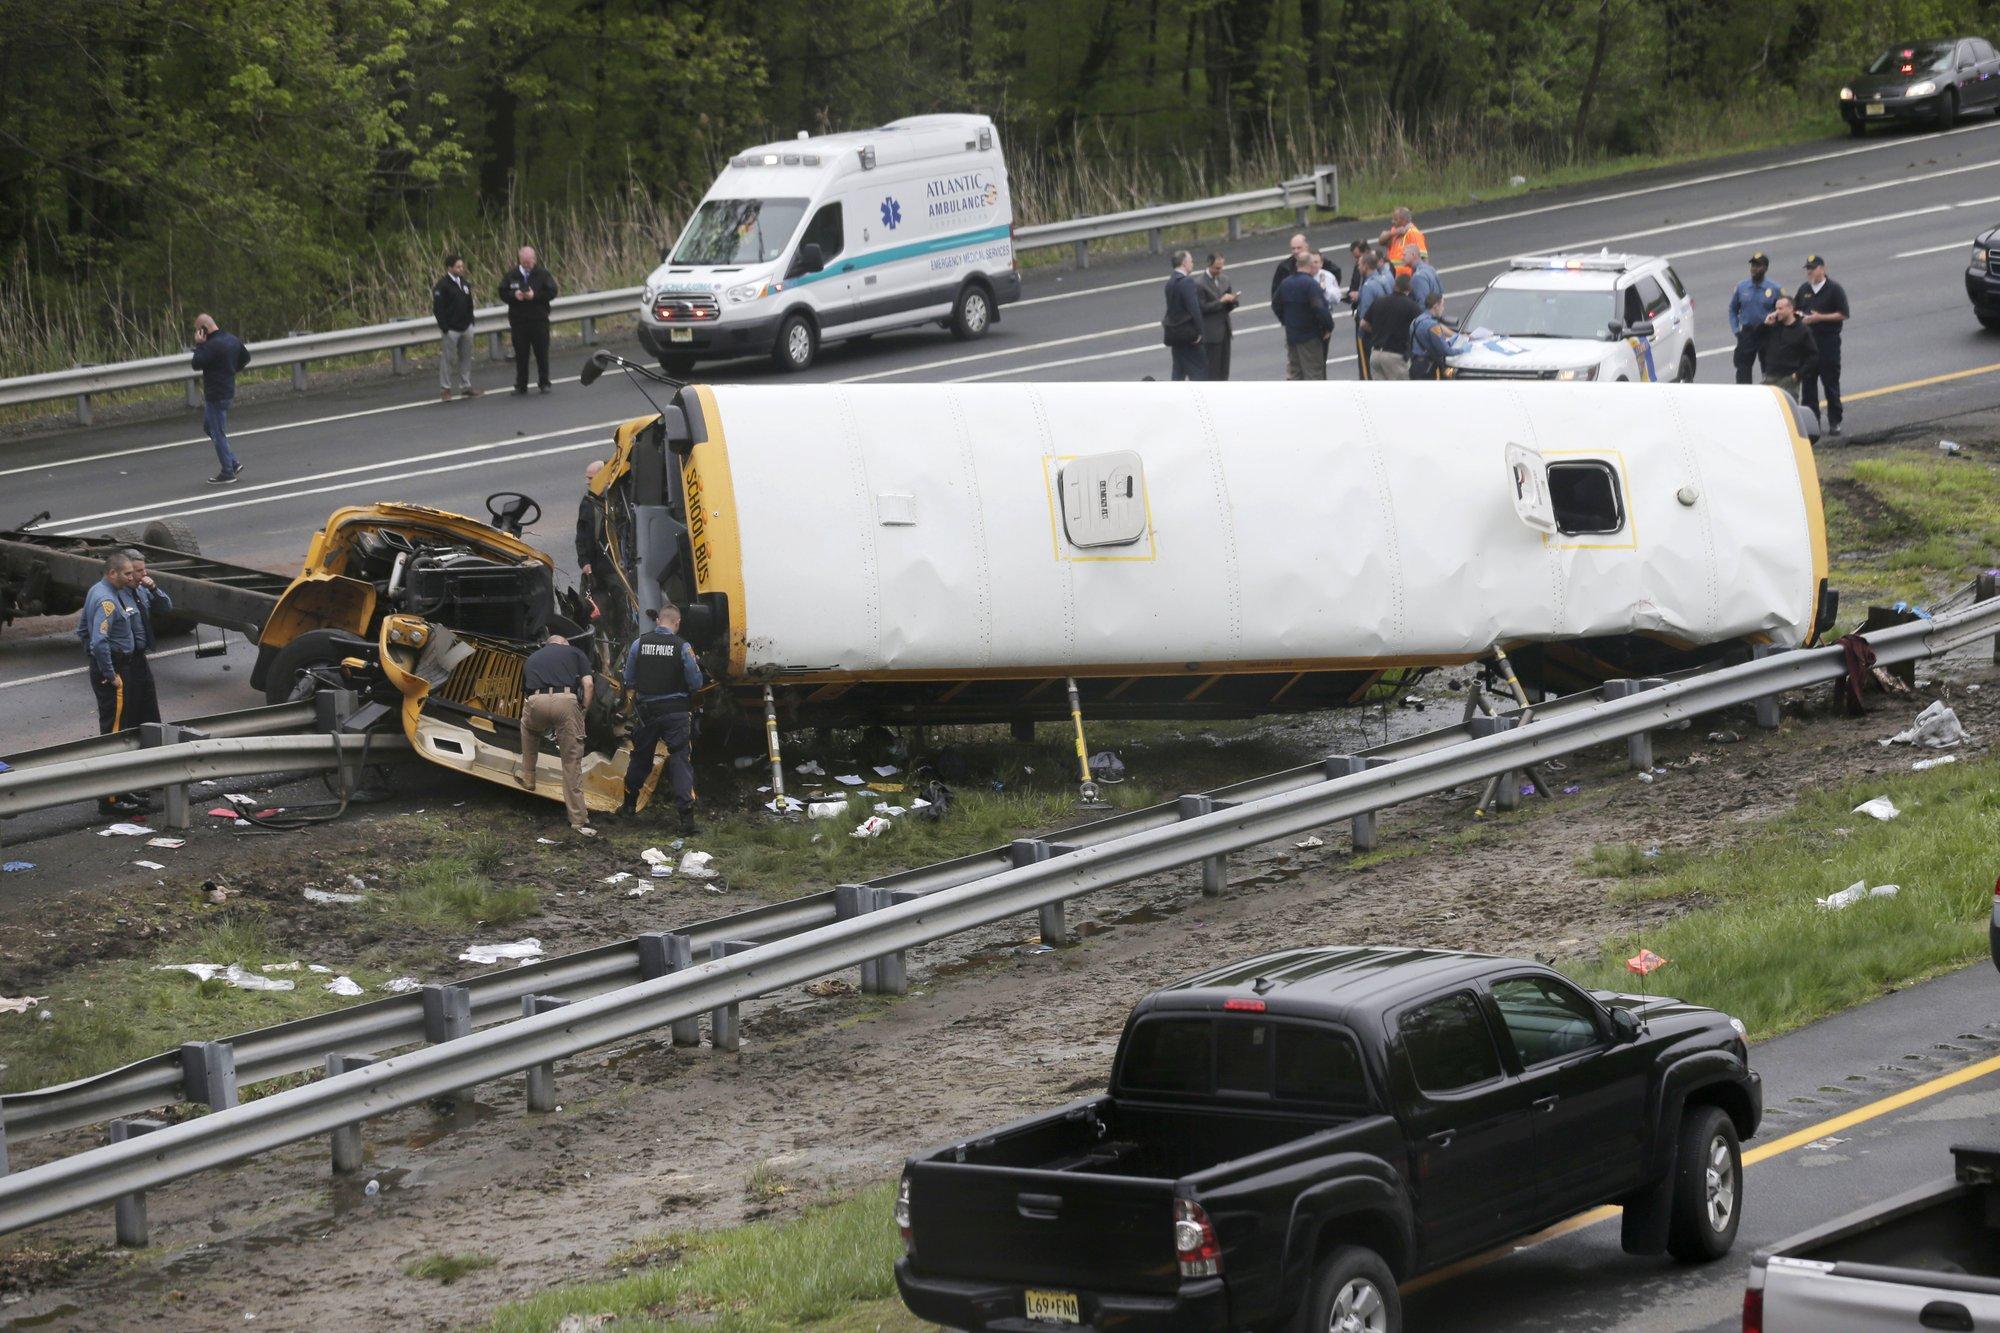 Trucking company owner 'saddened' by fatal school bus crash